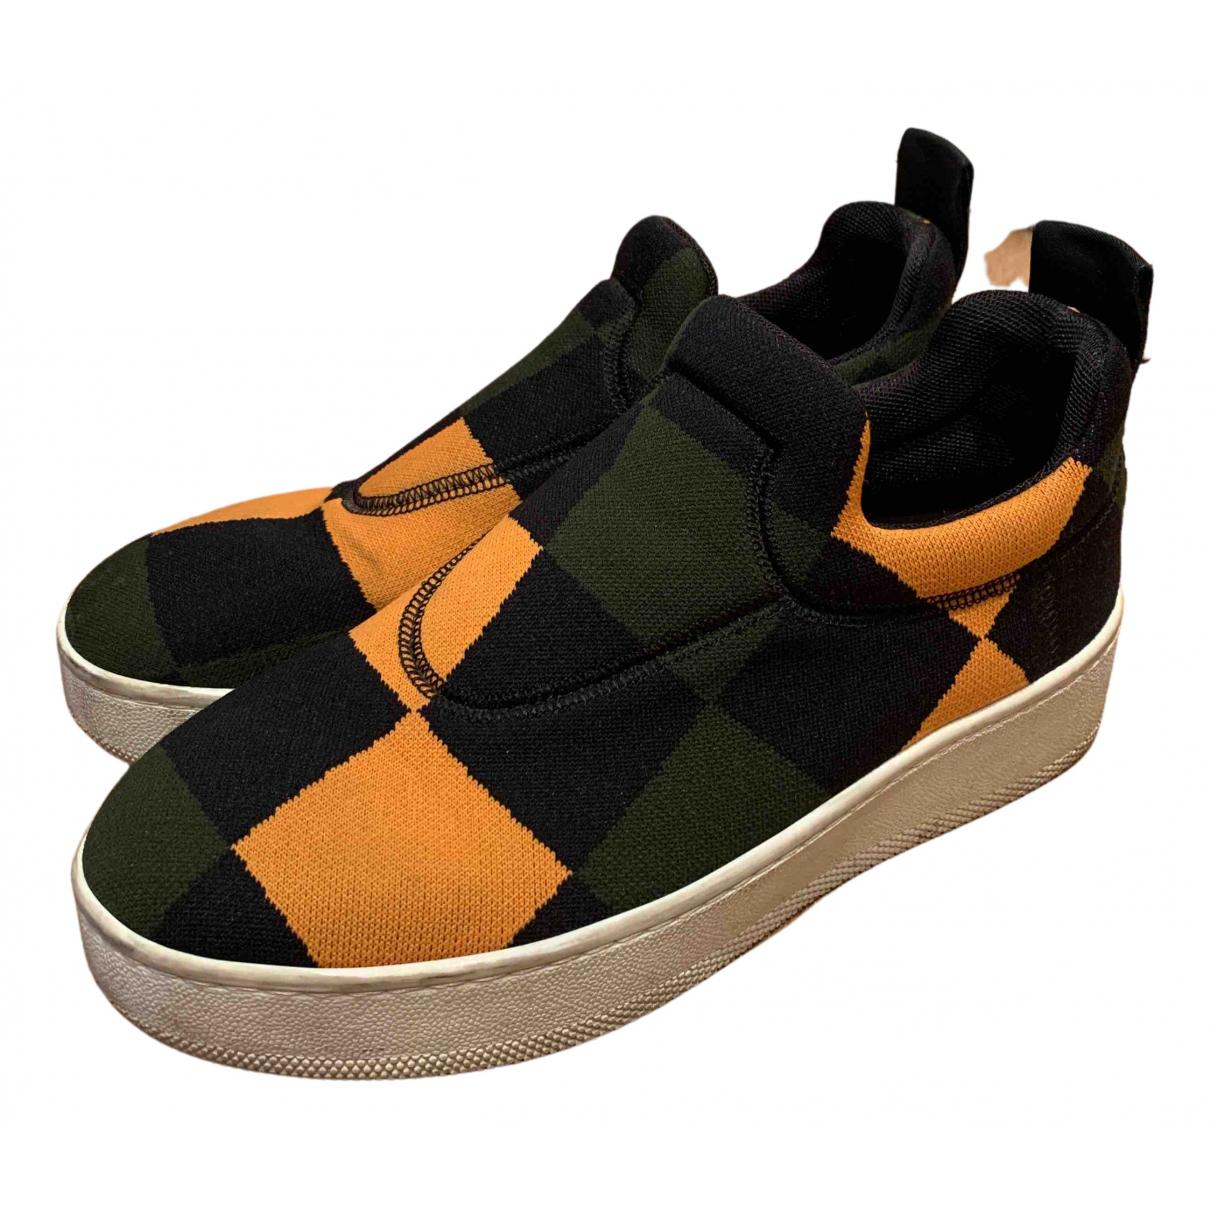 Celine \N Sneakers in  Bunt Leinen